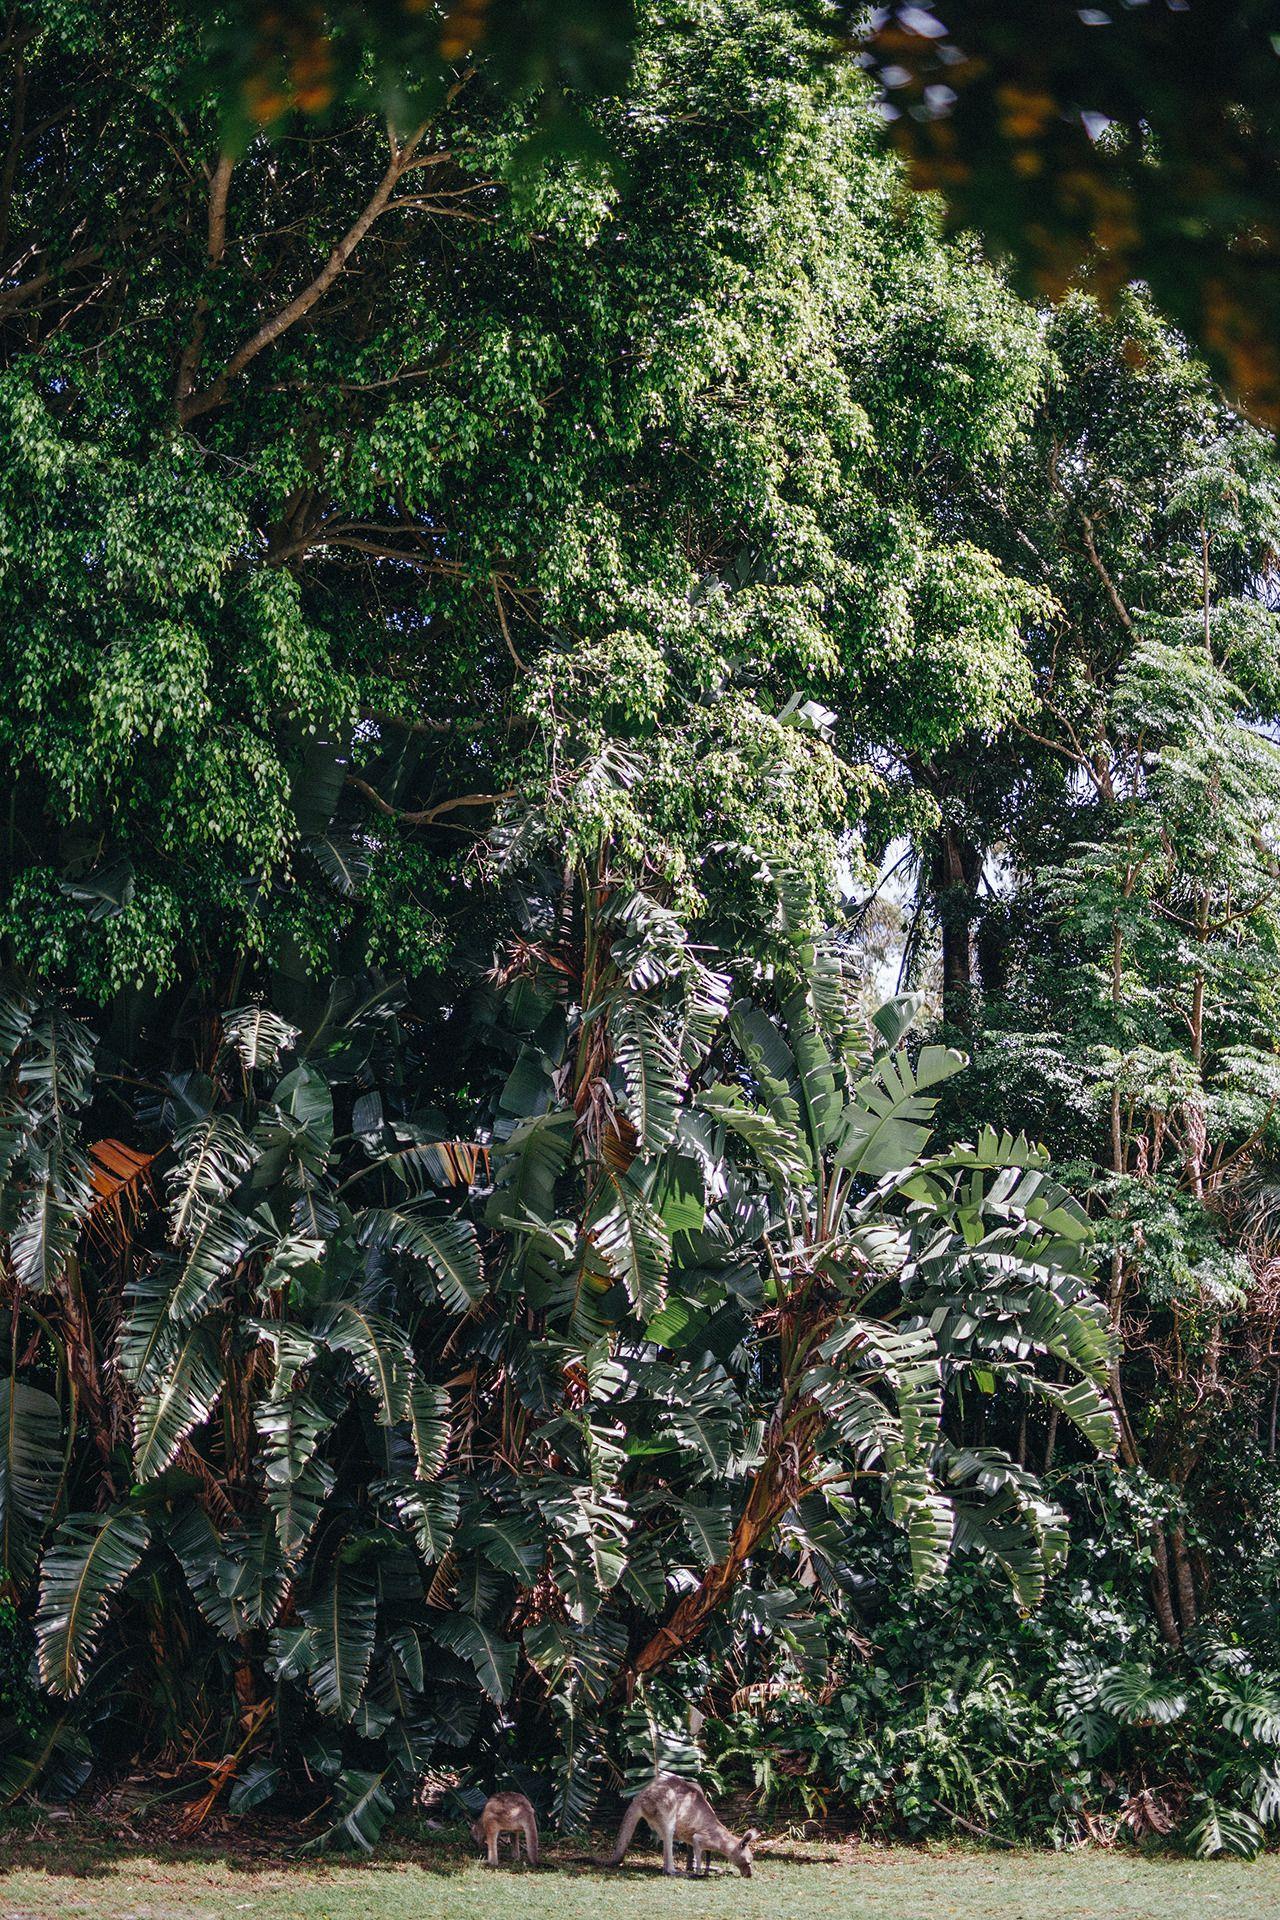 Jungle roos - #AUSTRALIA #Australien #blog #fotografie #kangaroo #kind #landscape #Landschaft #mit #on #photographers #reiseblog #reisen #rocks #south #travel #tumblr #west